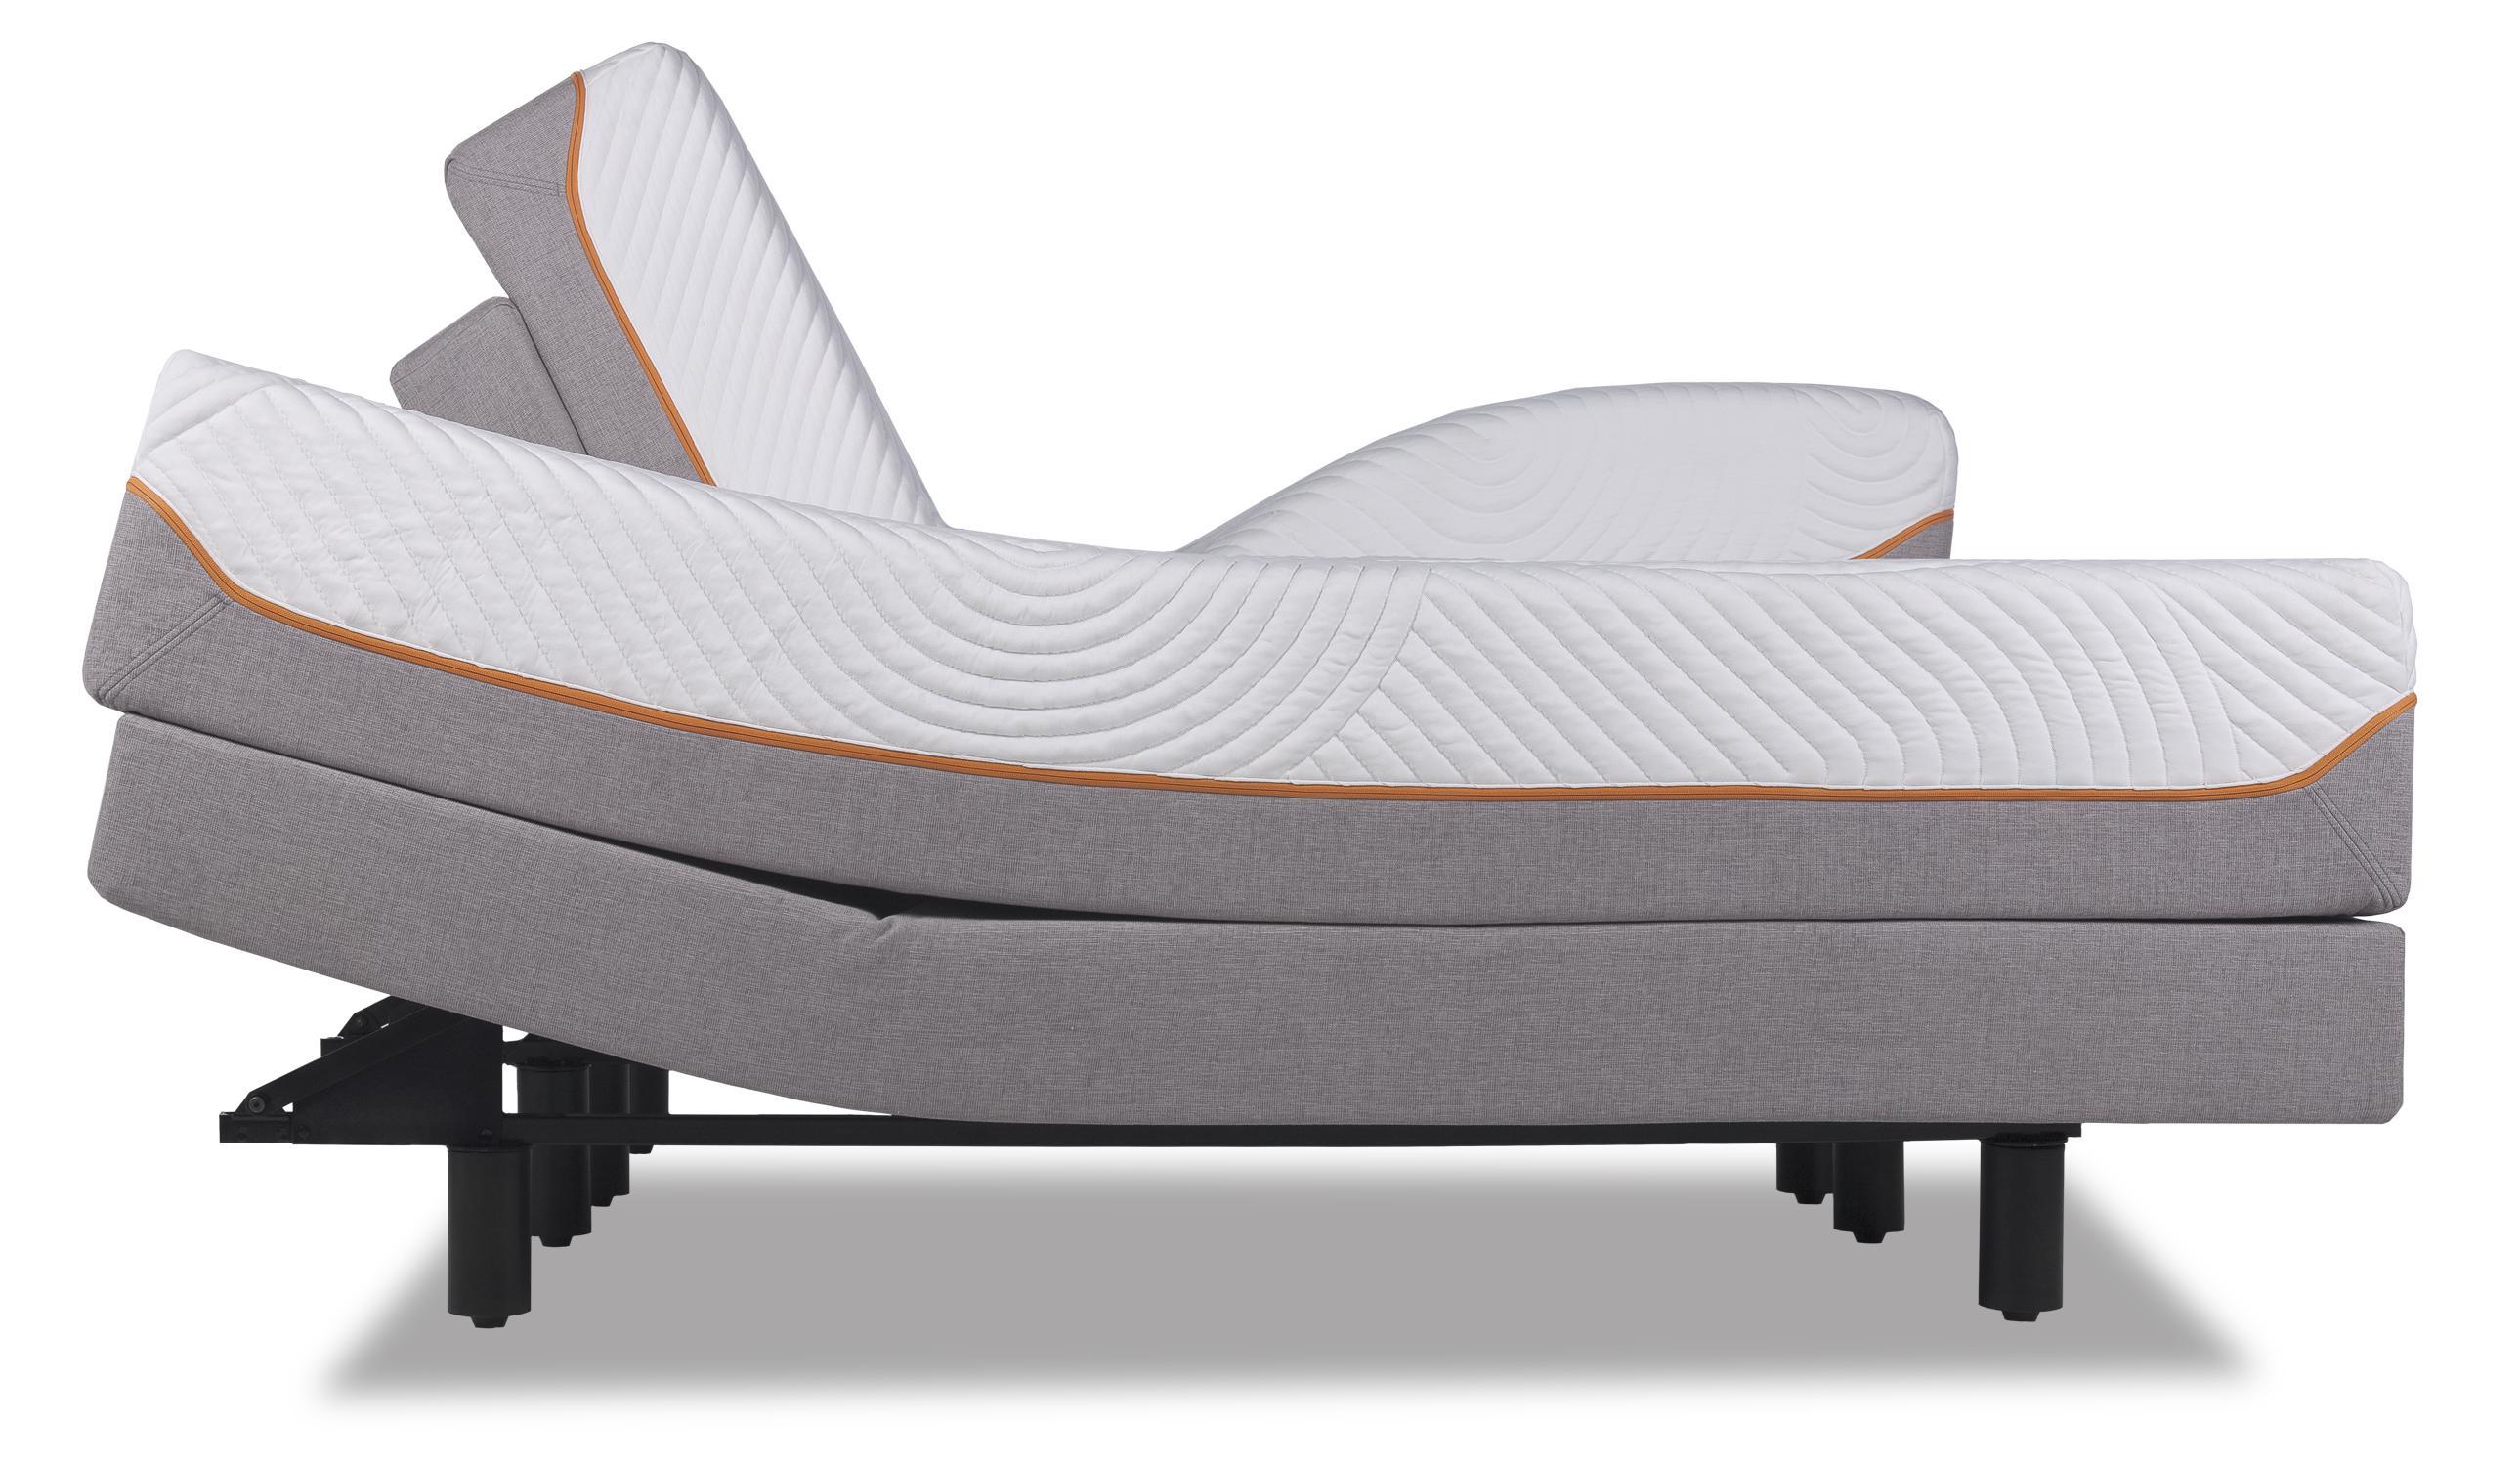 Tempur-Pedic® TEMPUR-Contour Supreme Full Firm Mattress Set - Item Number: 10256130+25565230